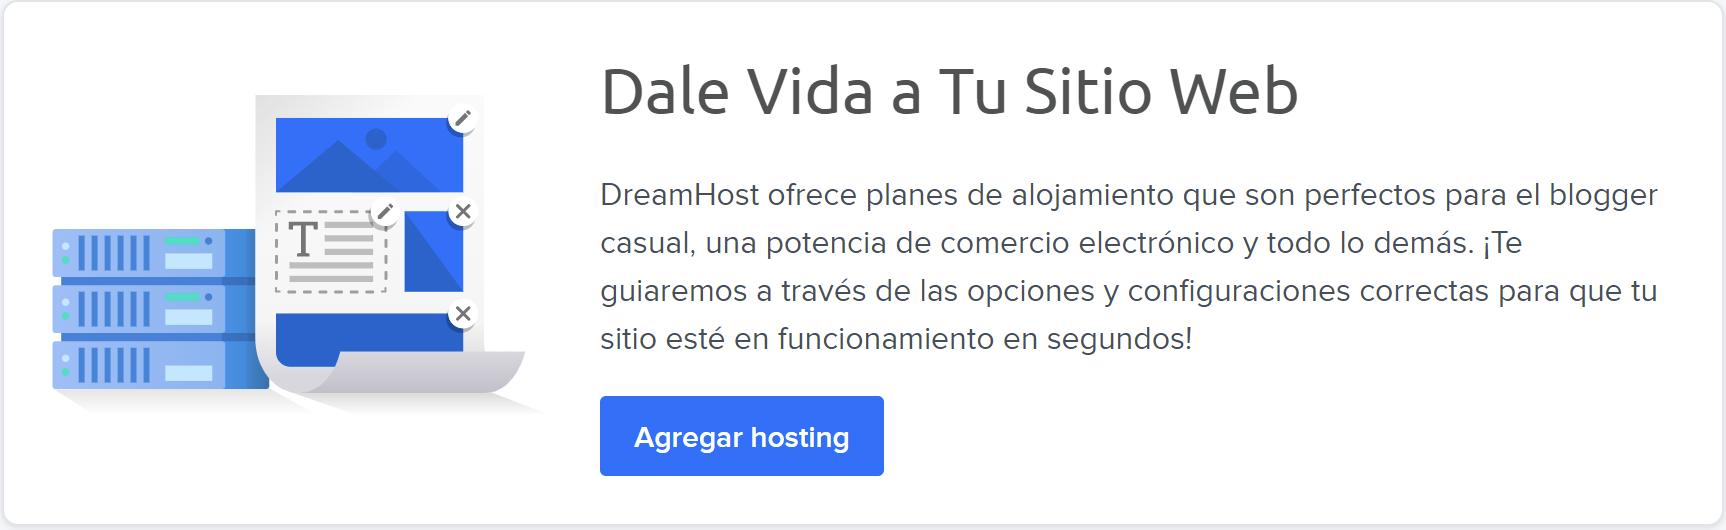 Add Hosting